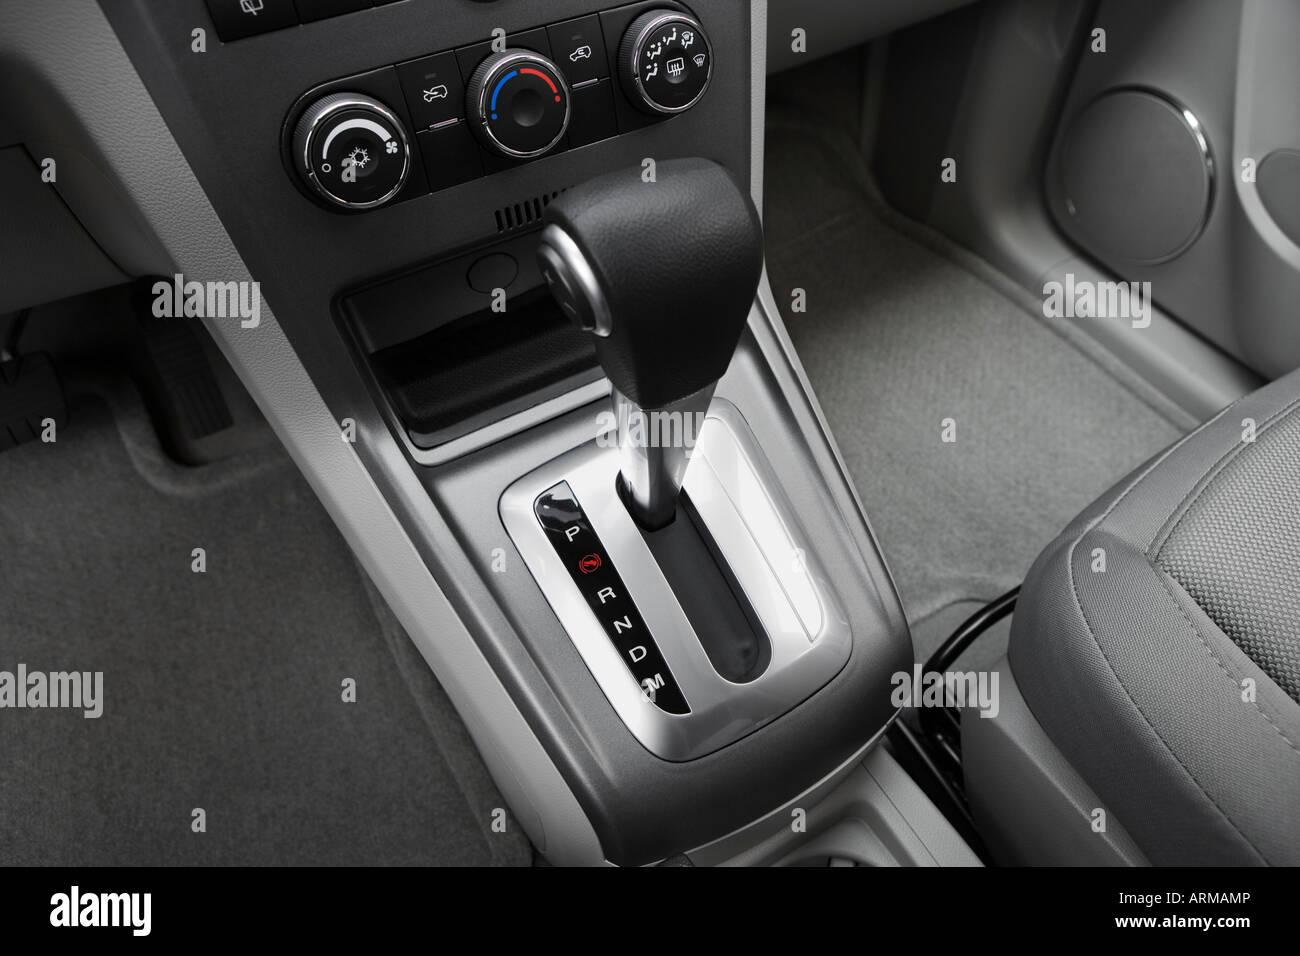 2008 saturn vue xe in blue gear shifter center console